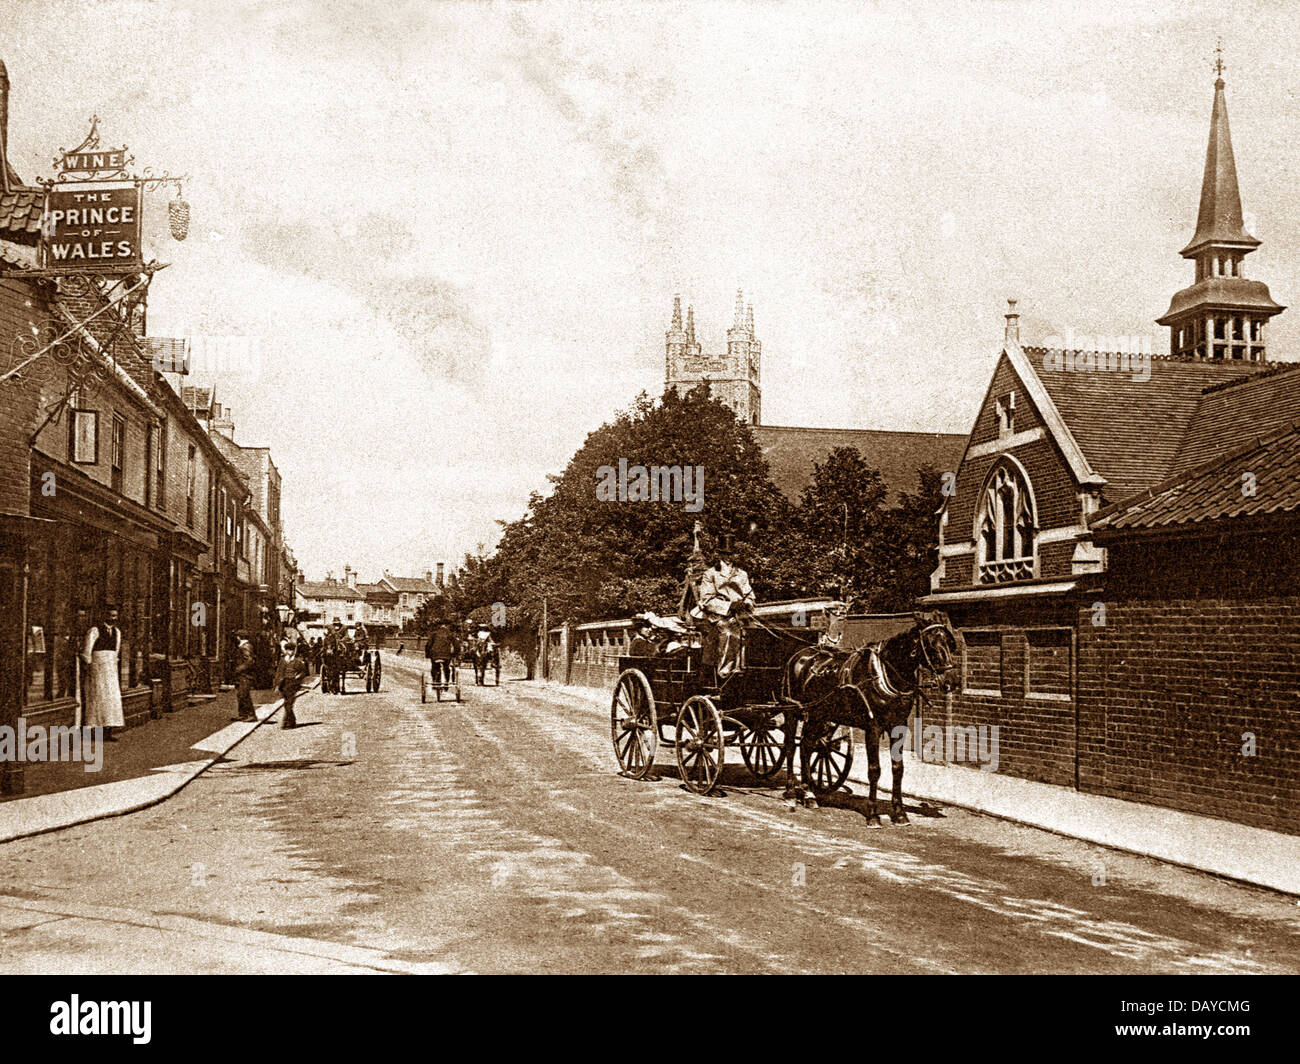 Bungay St. Mary's Street early 1900s - Stock Image